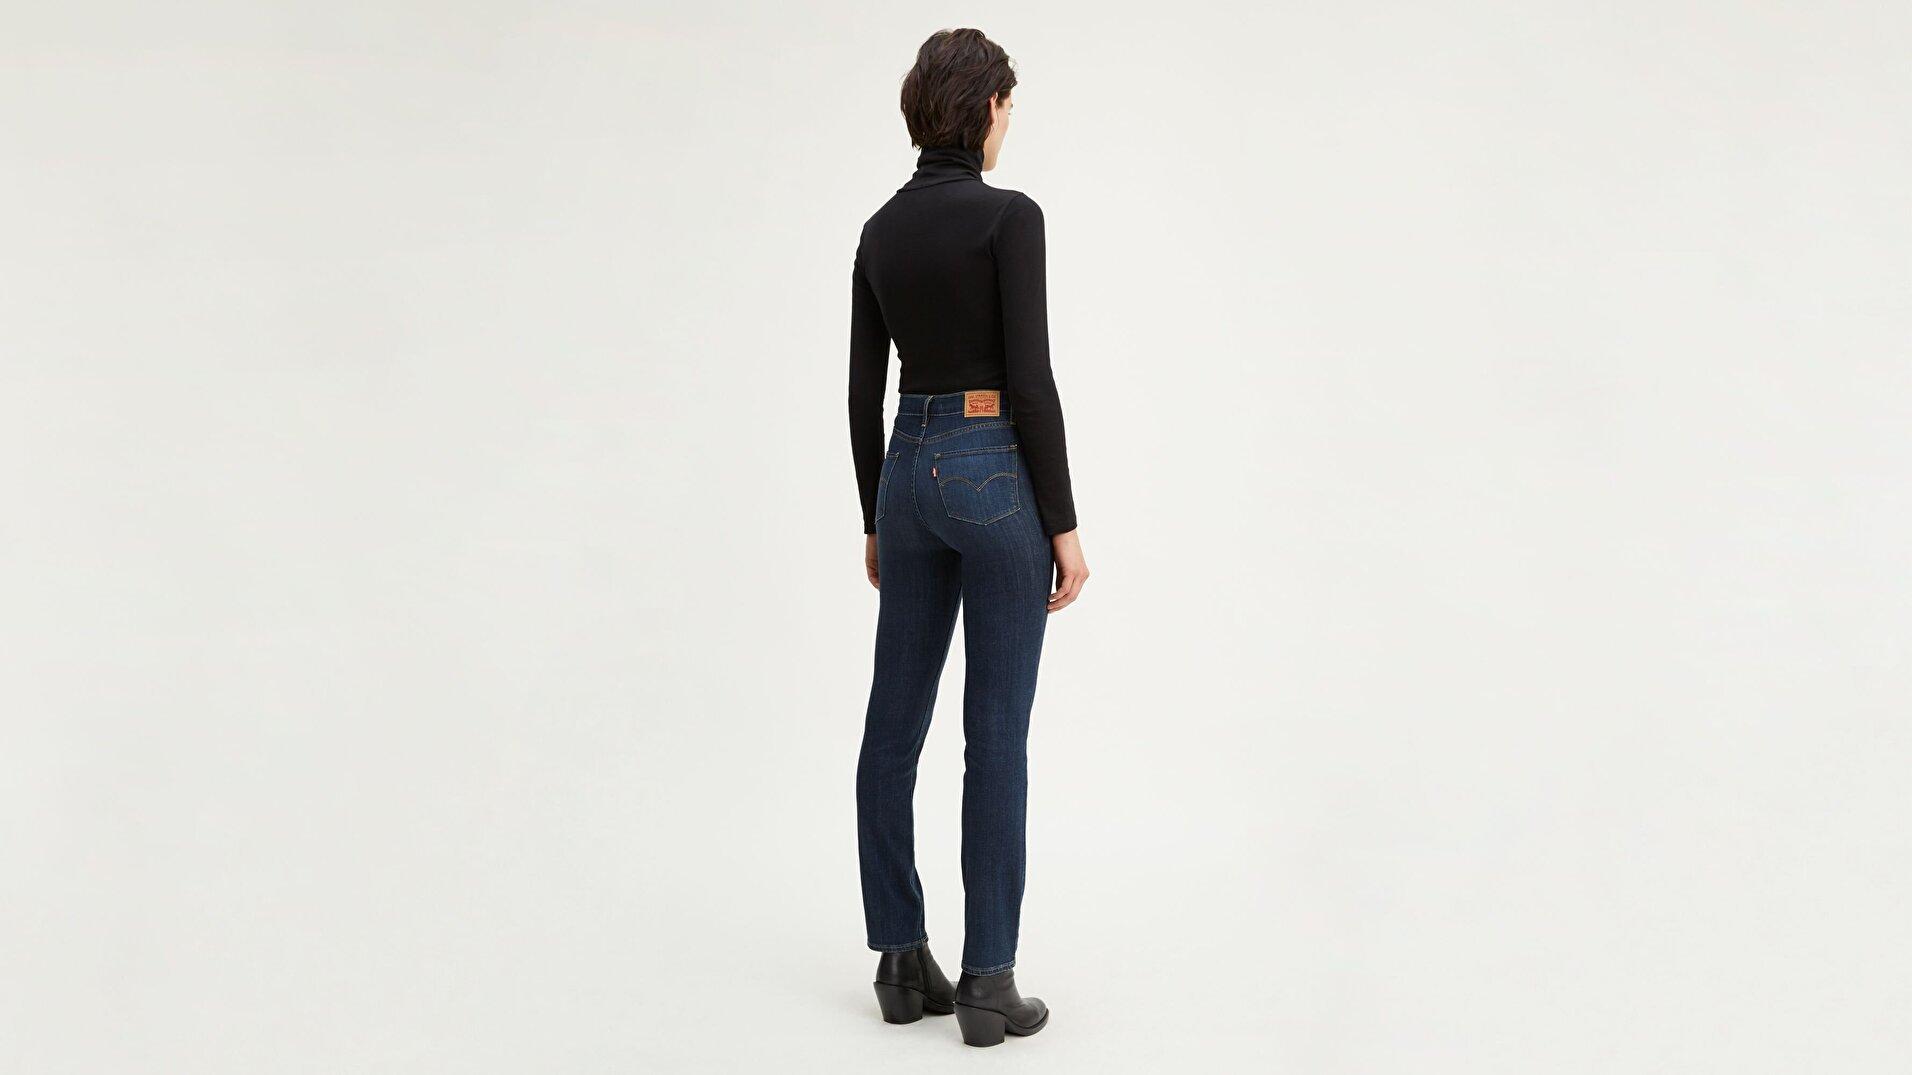 724 Yüksel Bel  Kadın Jean Pantolon-Carbon Glow